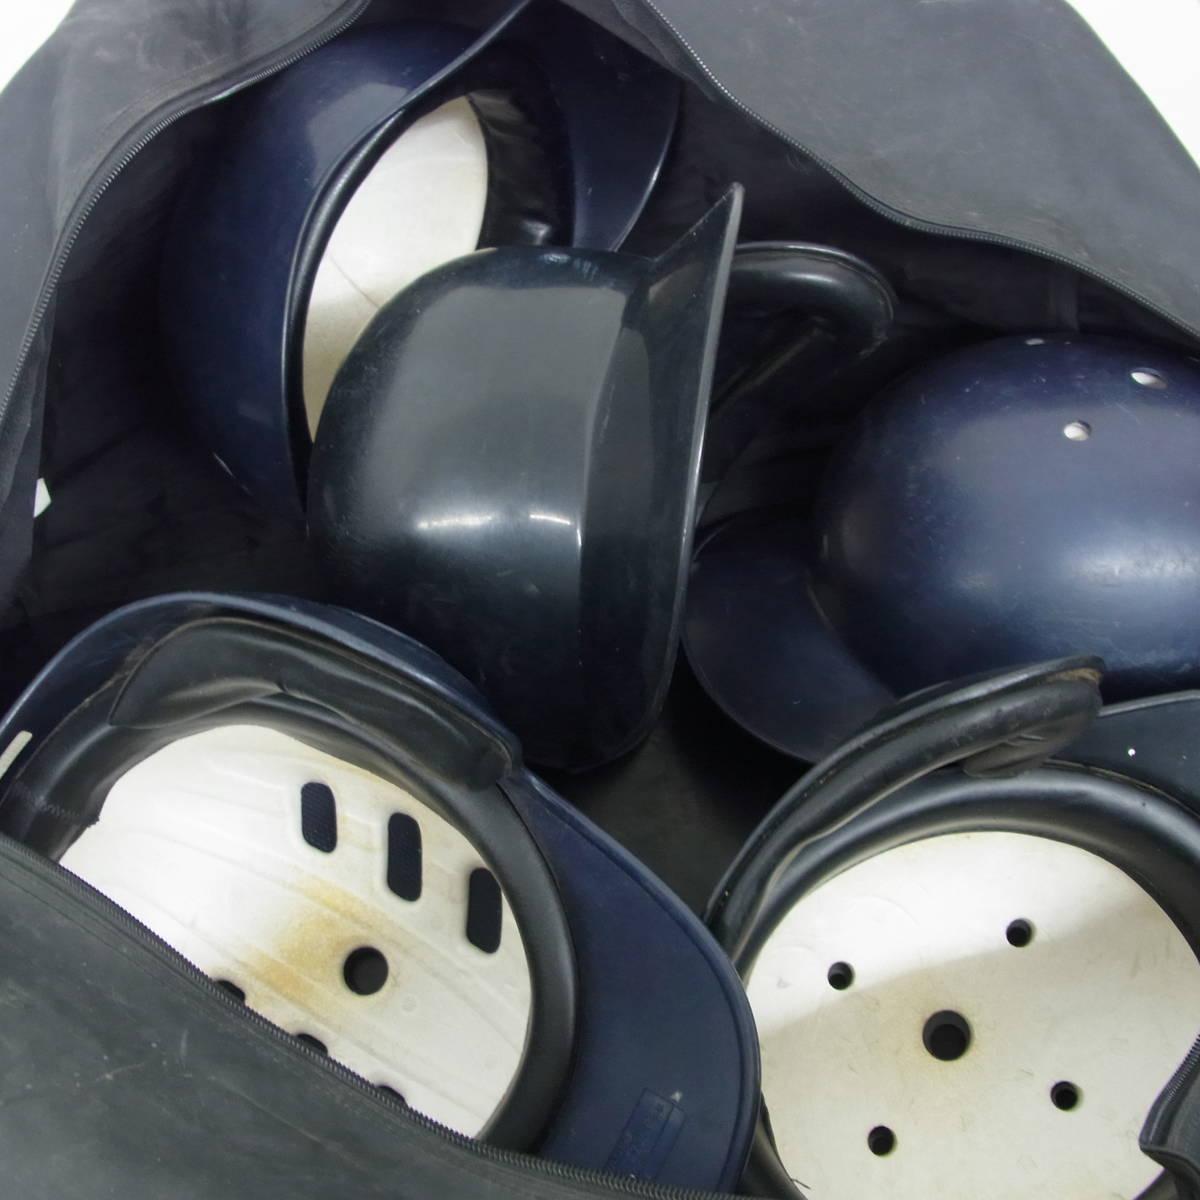 MIZUNO ミズノ ZETT ゼット 野球 ベースボール ヘルメット 5点セット J.S.B.B L×2 M×2 O×1 バッグ付き 難有特価_画像5